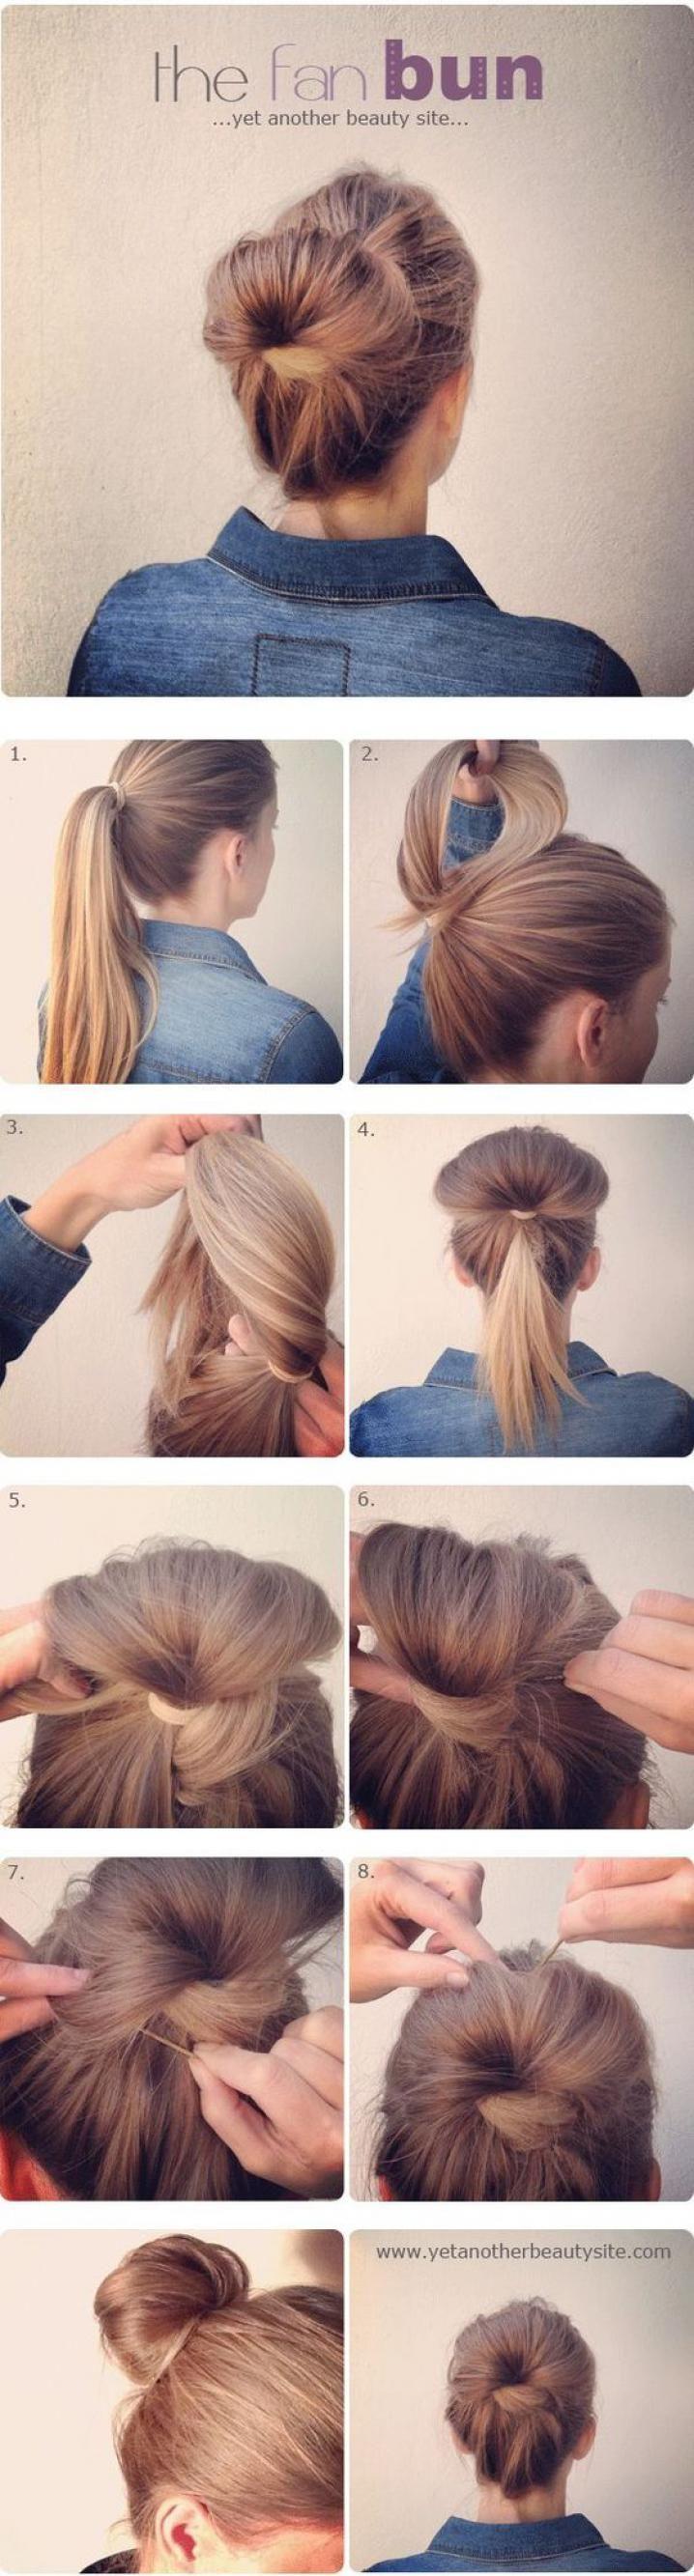 Pinspiration gemakkelijke minutenkapsels modern hairstyles